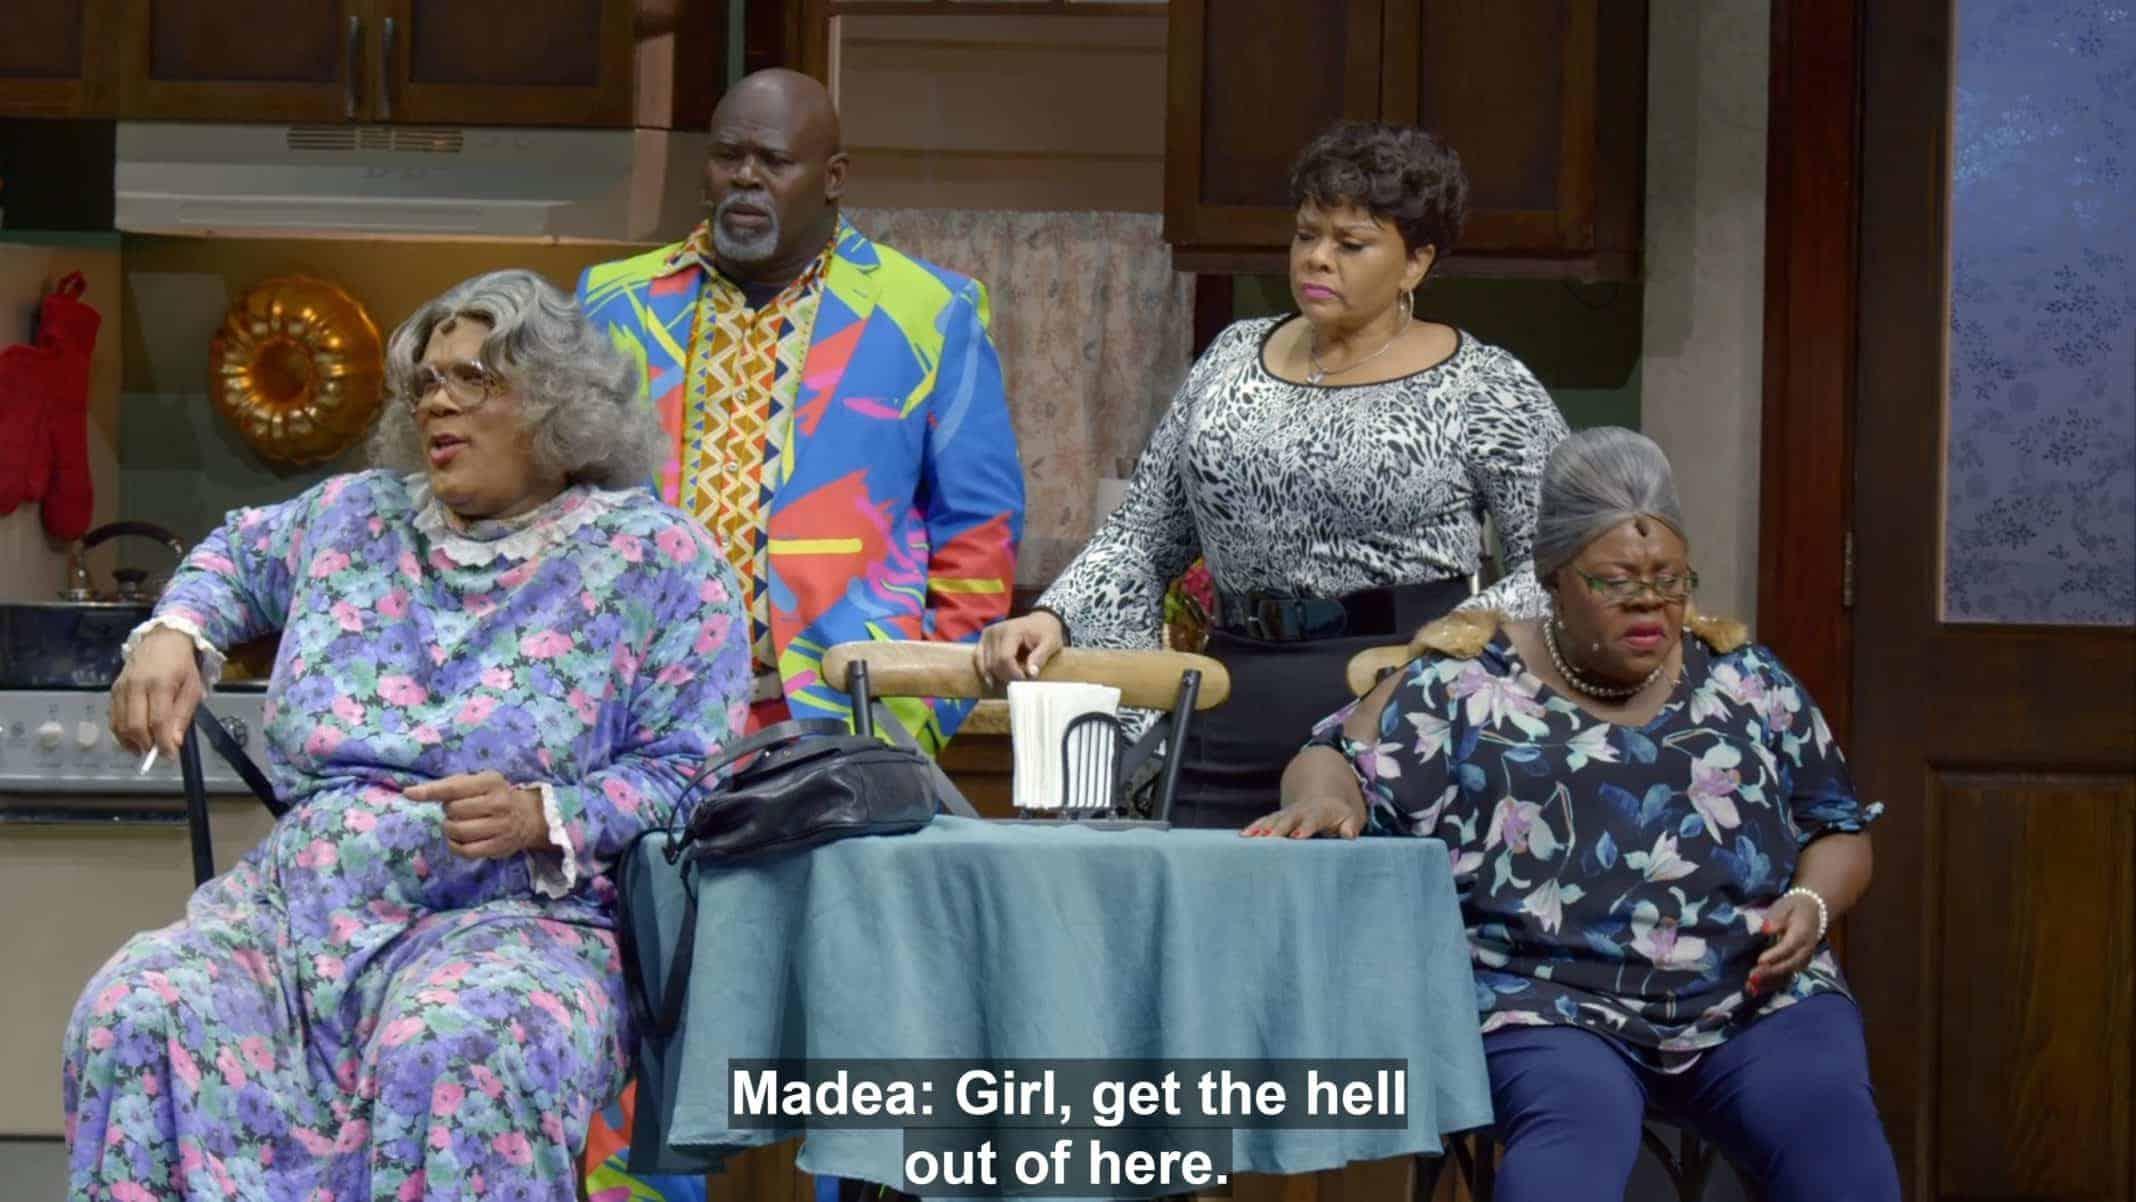 Madea (Tyler Perry), Mr. Brown (David Mann), Cora (Tamela Mann), and Aunt Bam (Cassi Davis Patton) reacting to a reveal.